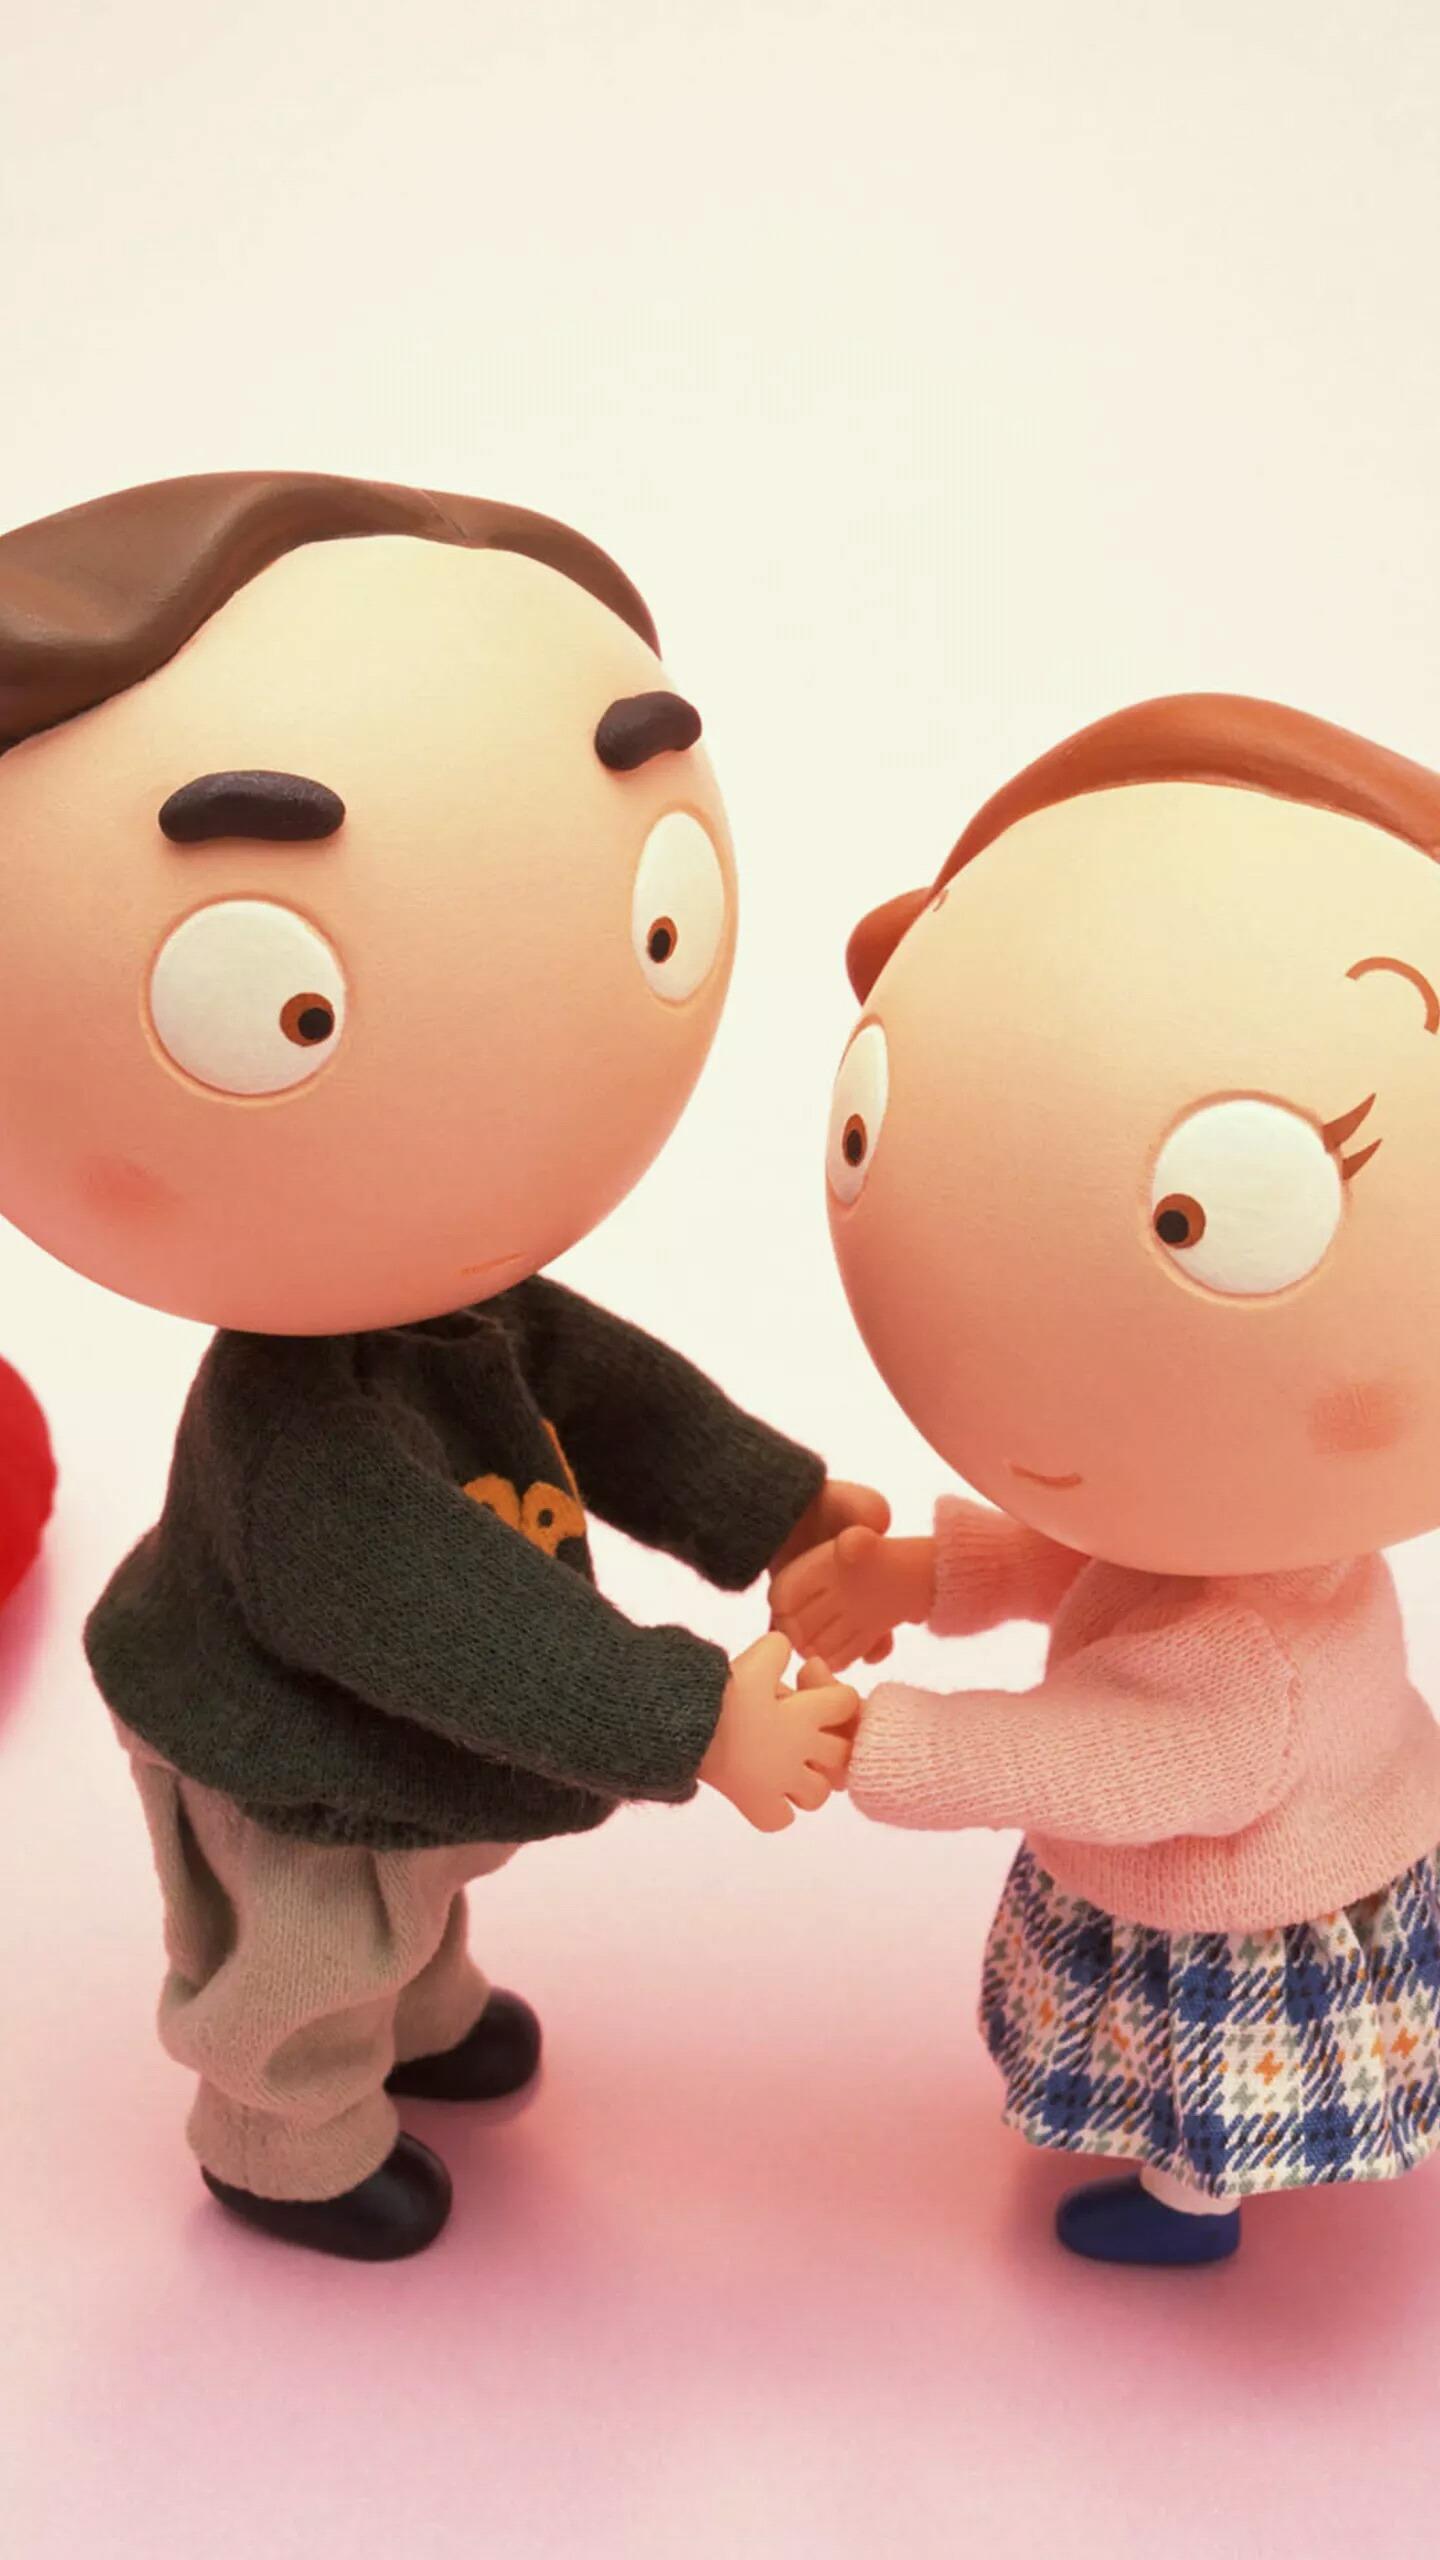 【v粉壁纸】可爱玩偶